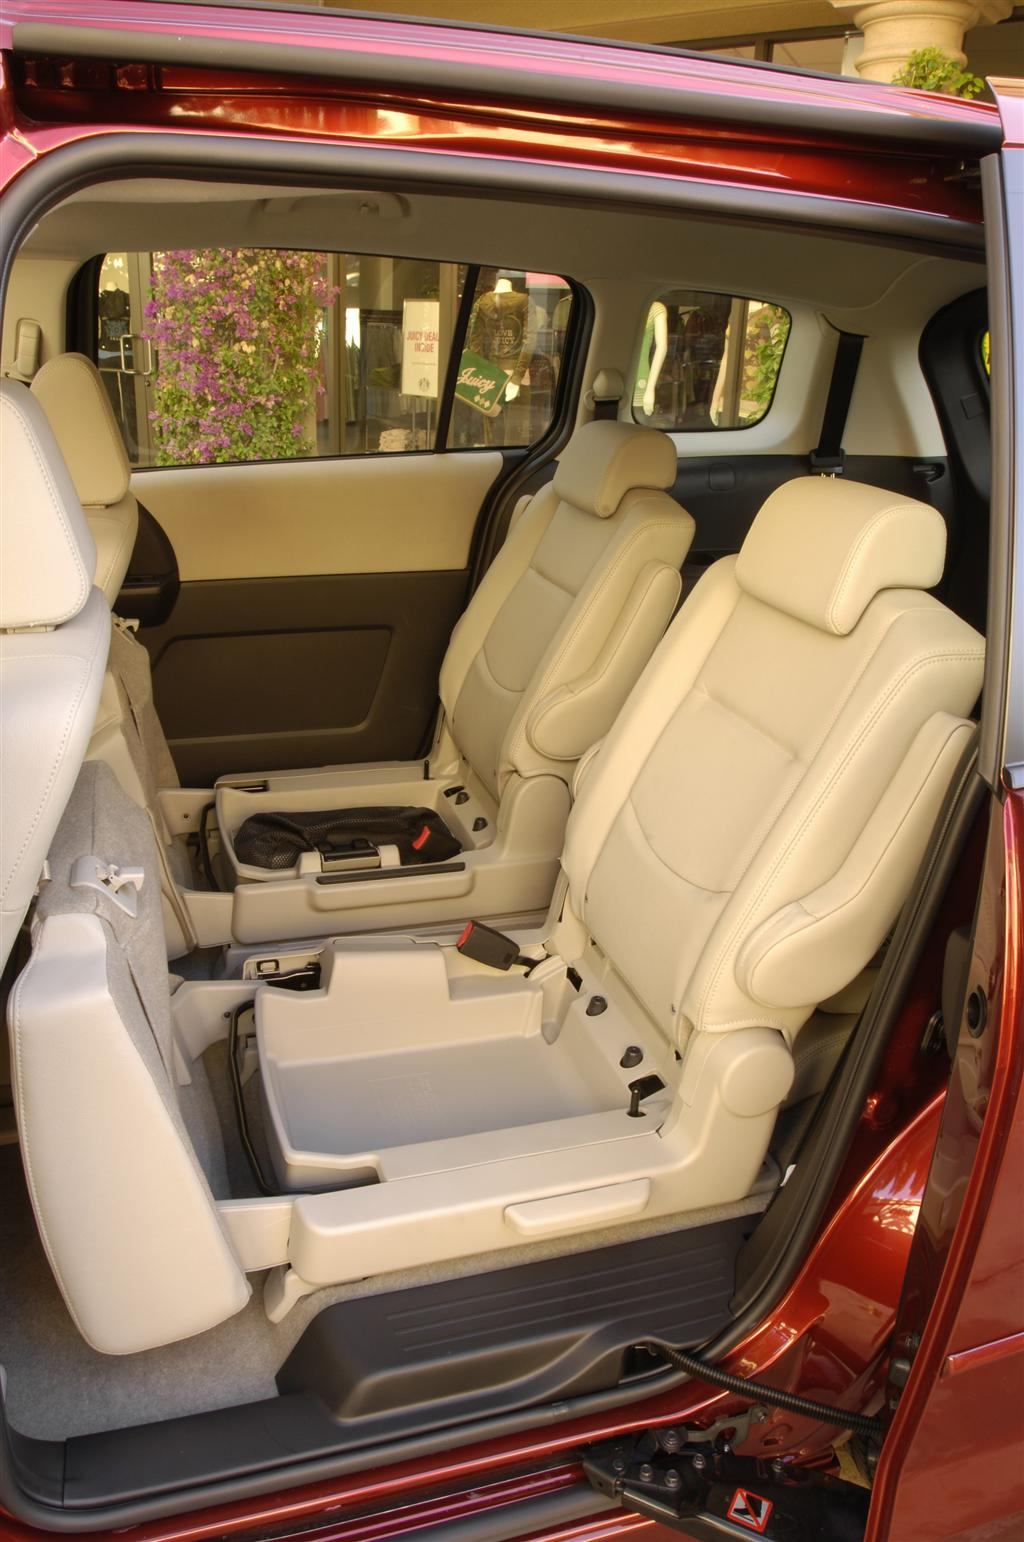 2009 Mazda 5 Conceptcarz Com